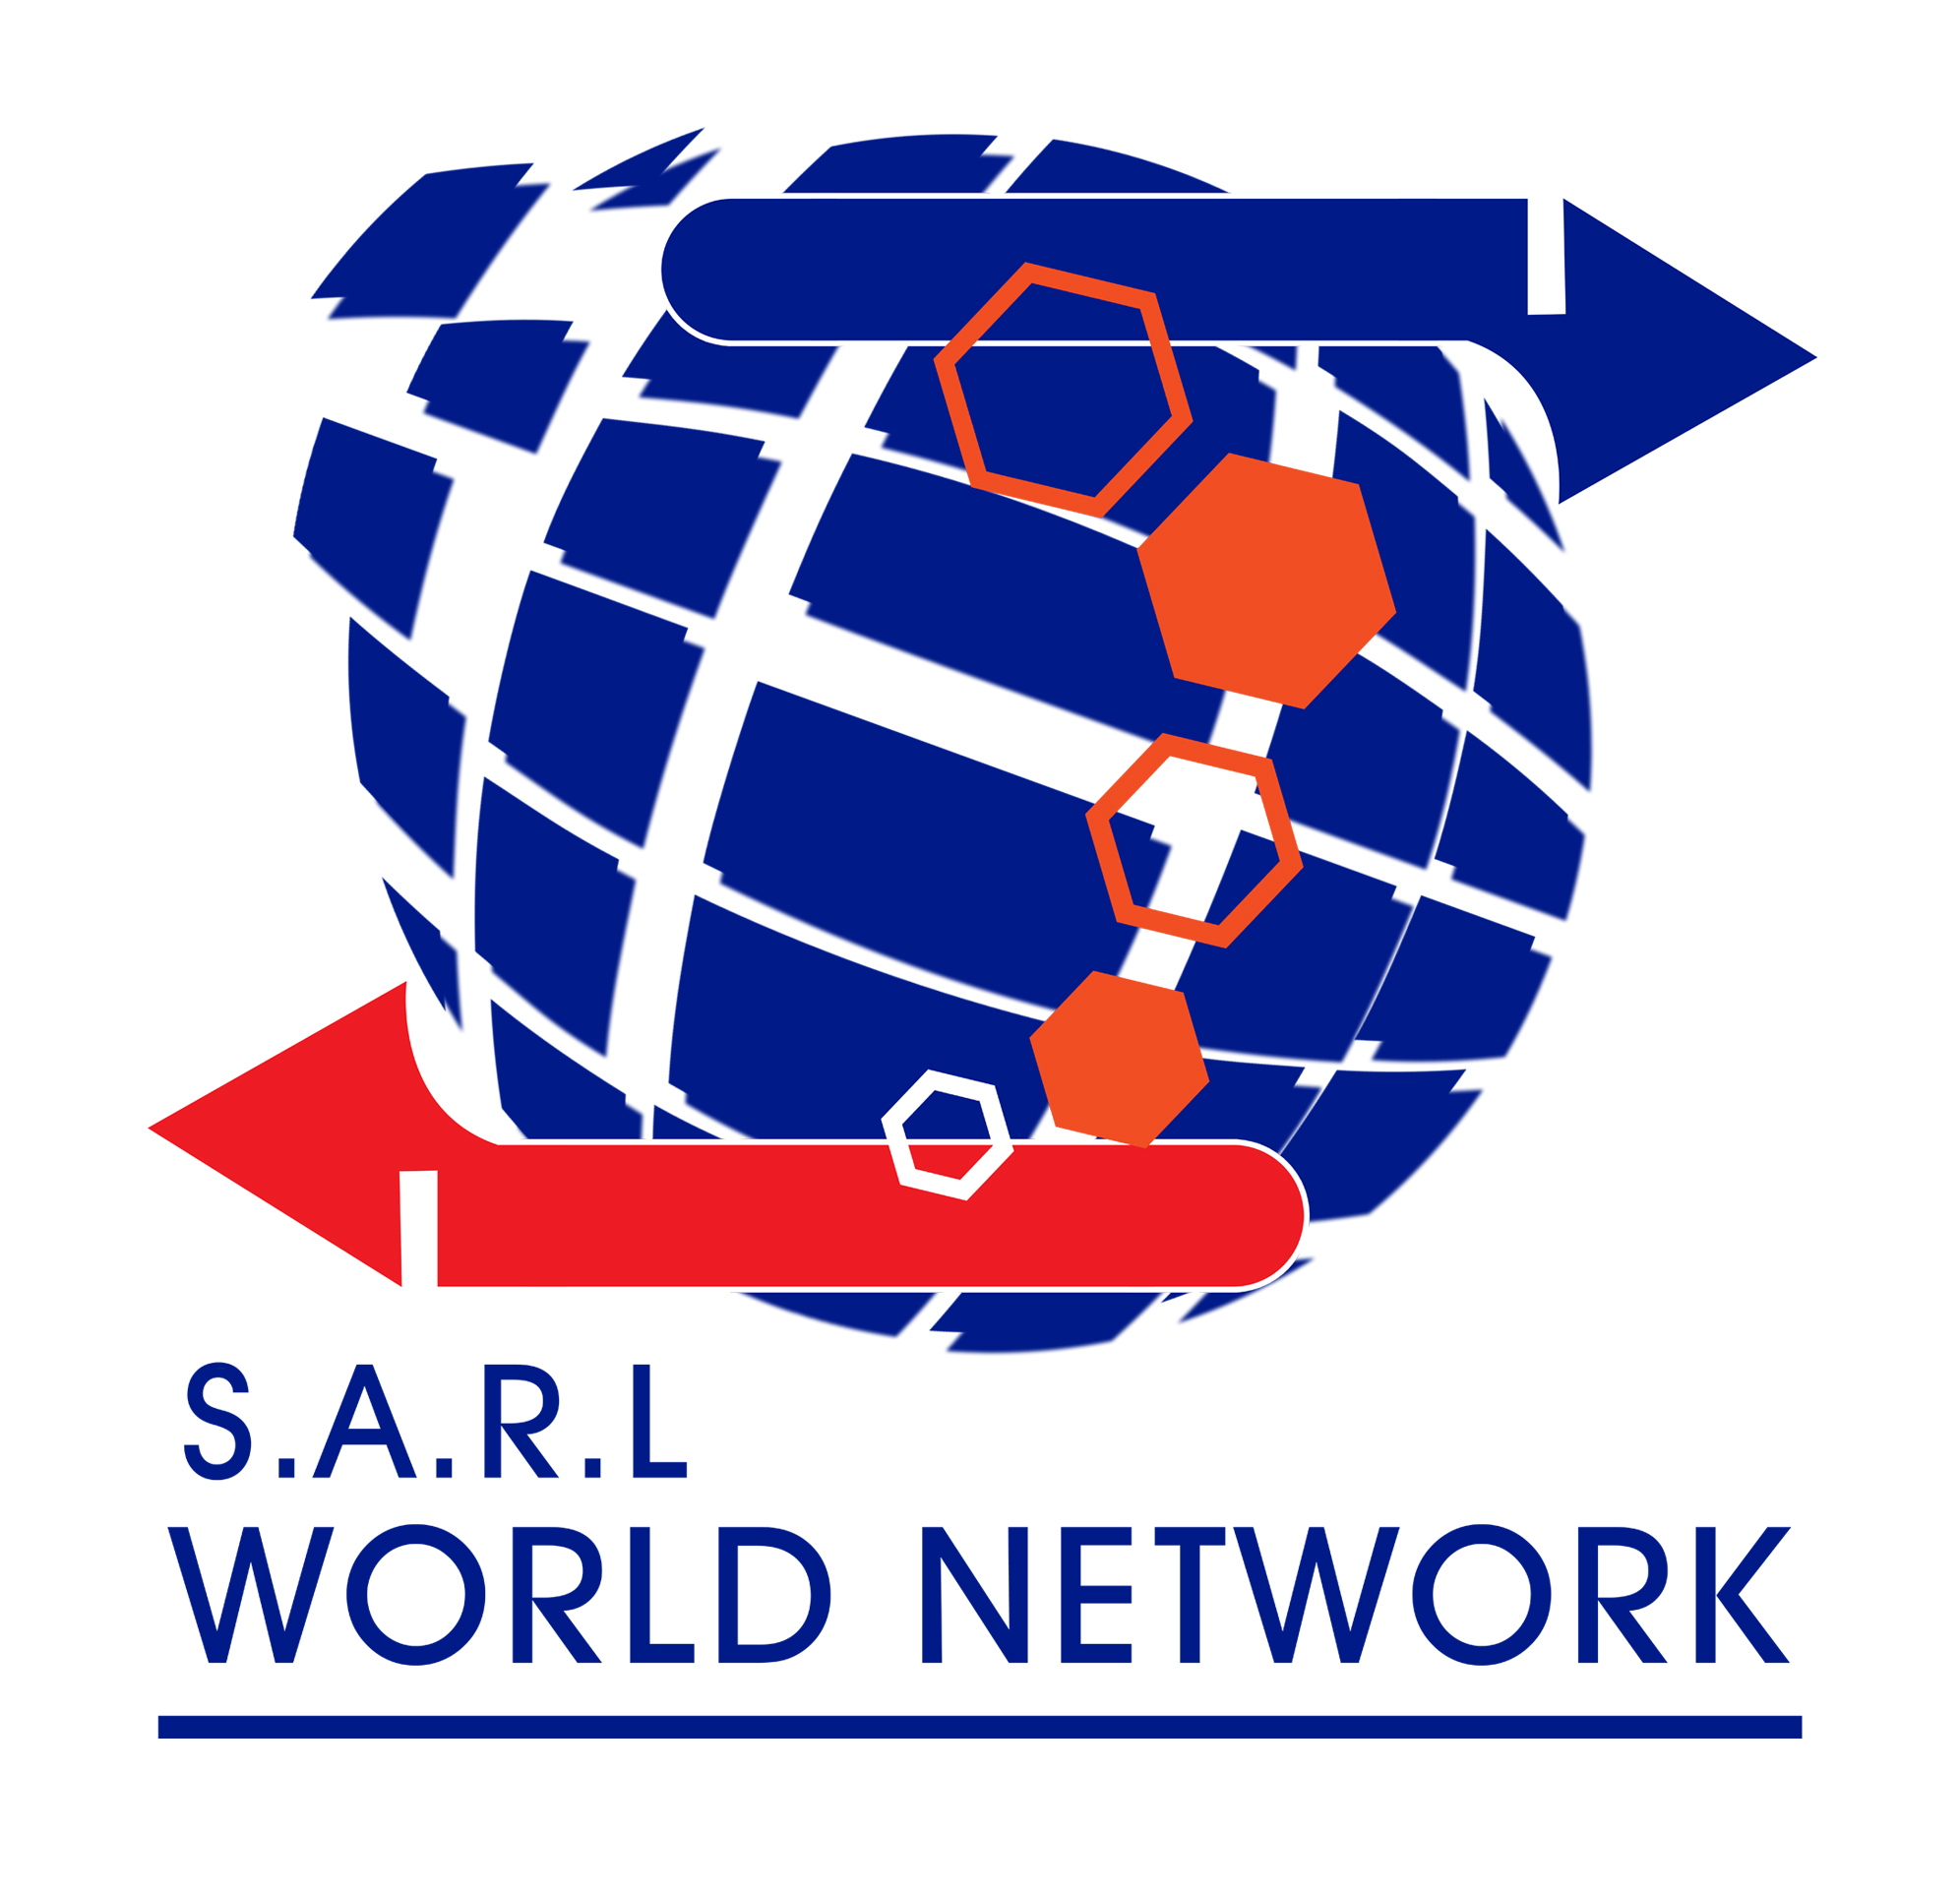 133736_logo_world_network.jpg